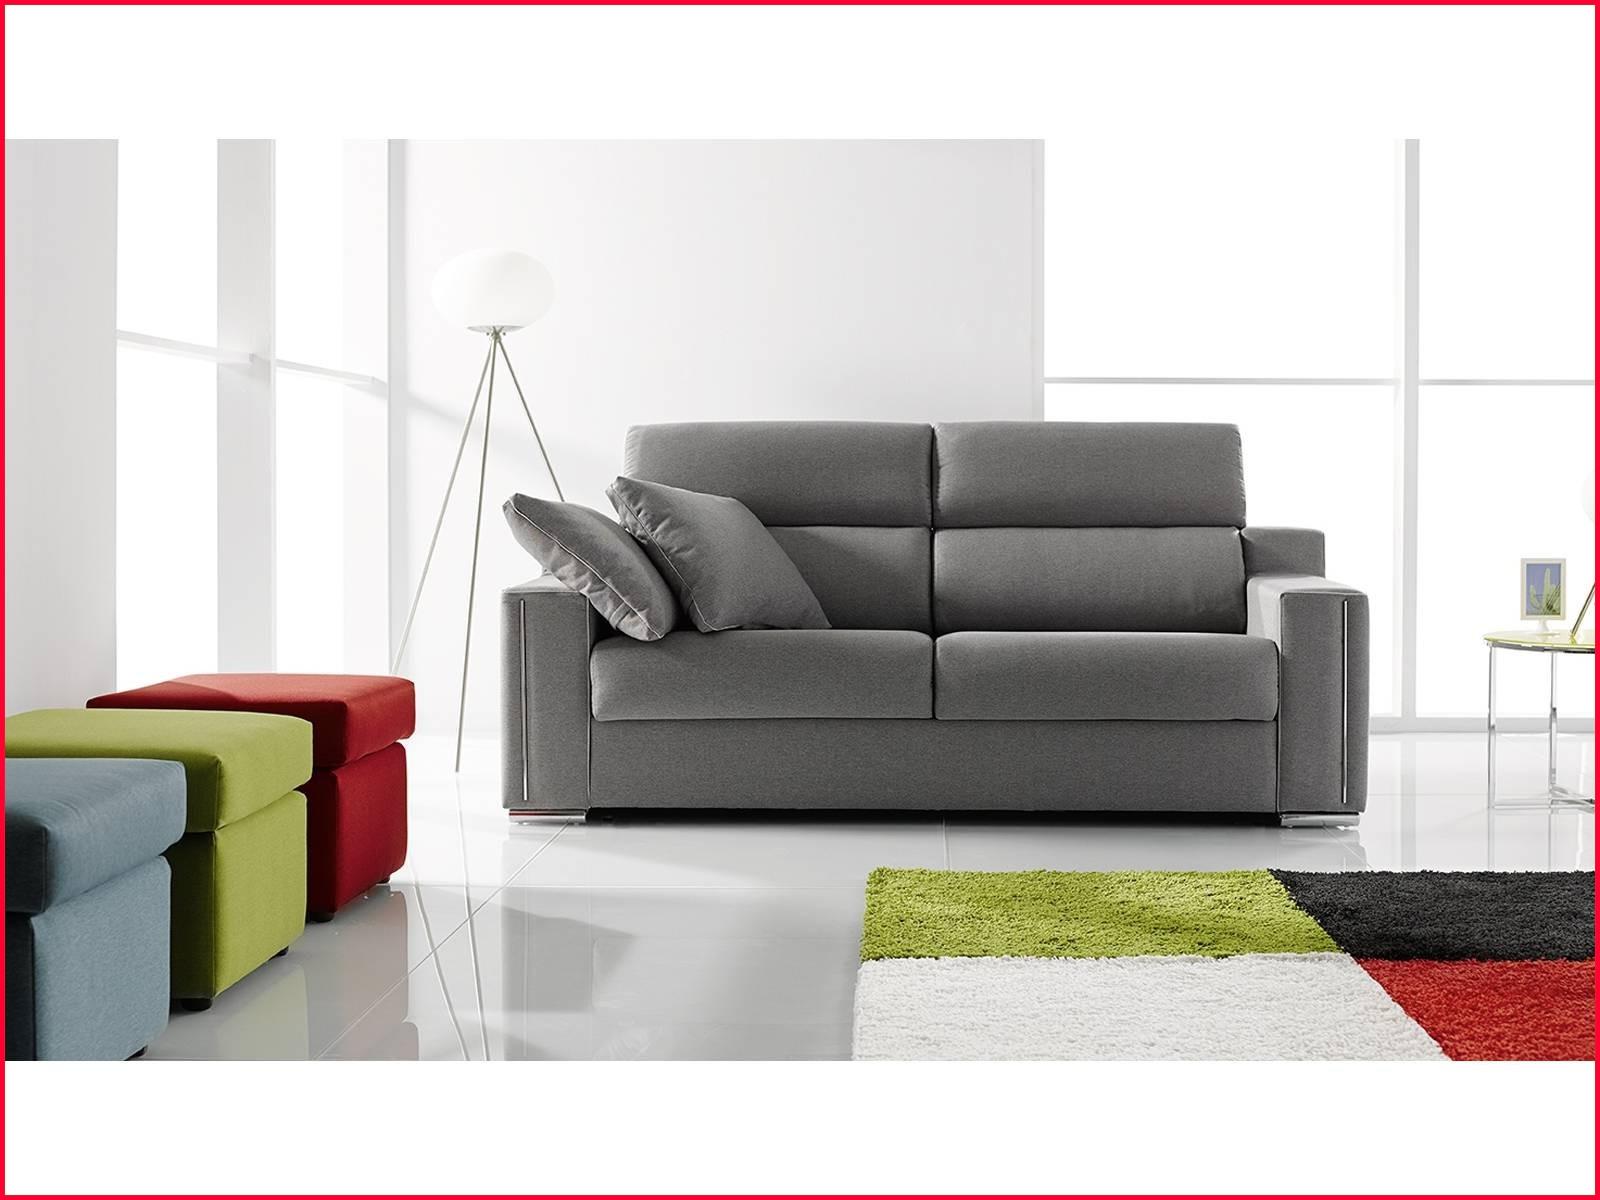 Merkamueble sofas O2d5 sofa Cama Merkamueble Merkamueble sofas Cama sofa Cama